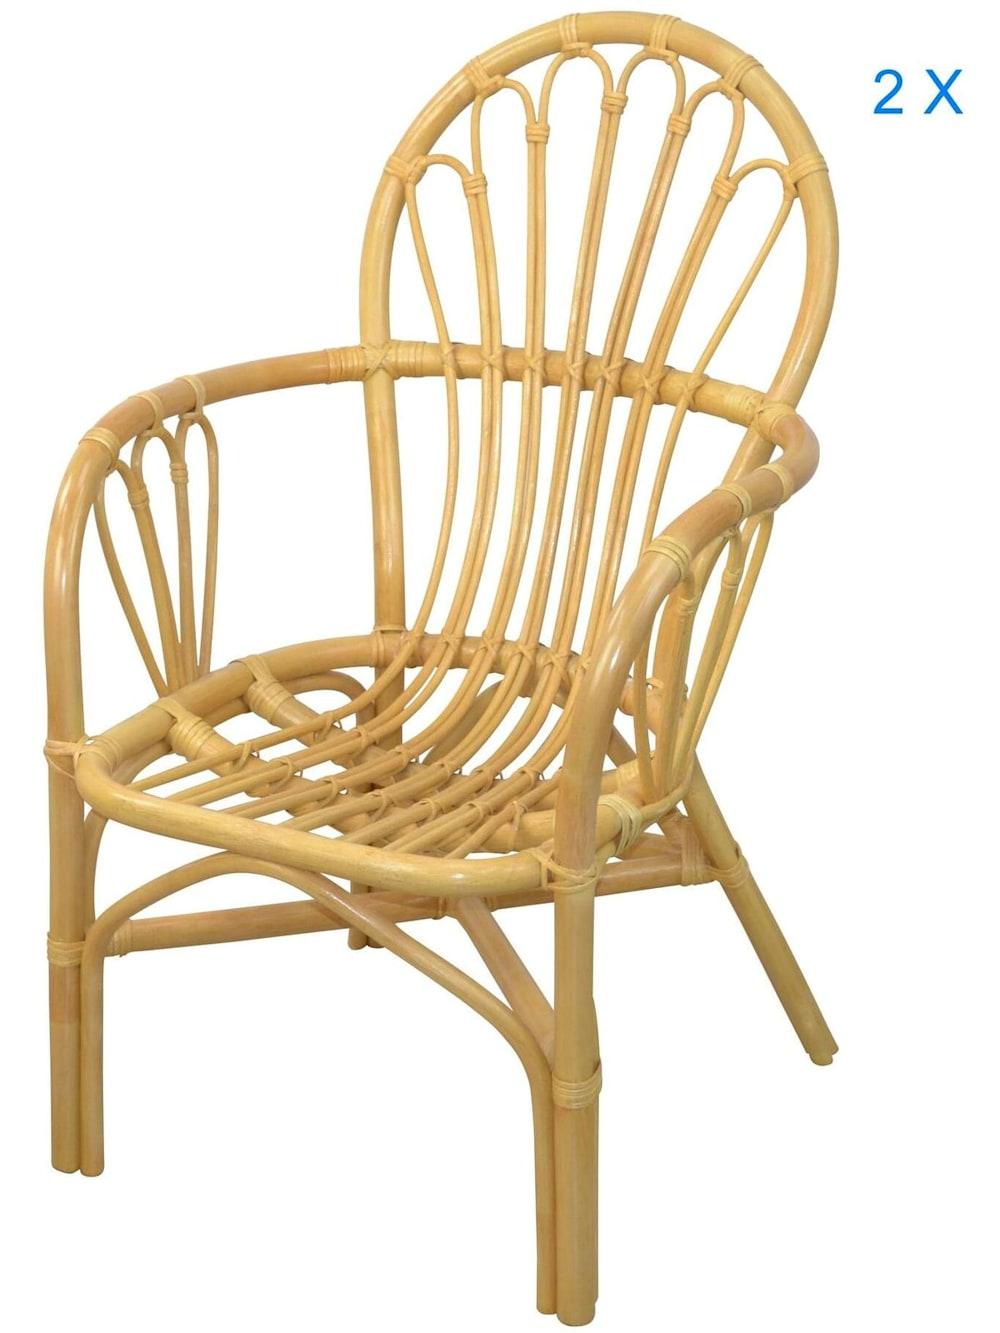 Möbel Direkt Online Rattansessel (2Stück) Conny | Klingel